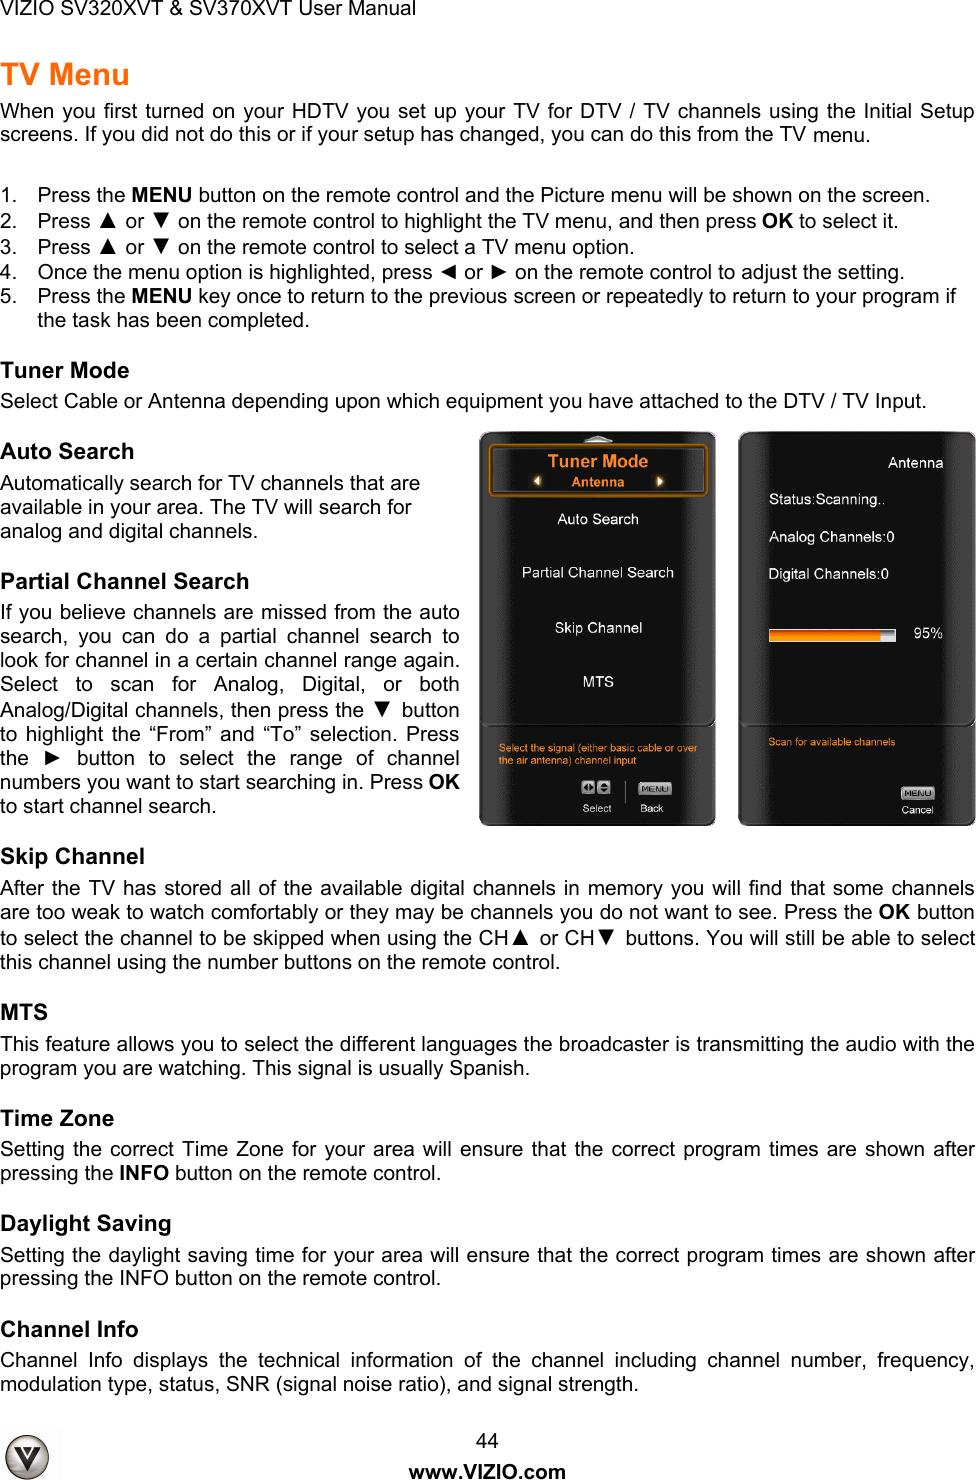 Vizio Sv320Xvt Users Manual 09 1096 SV320 & SV370XVT